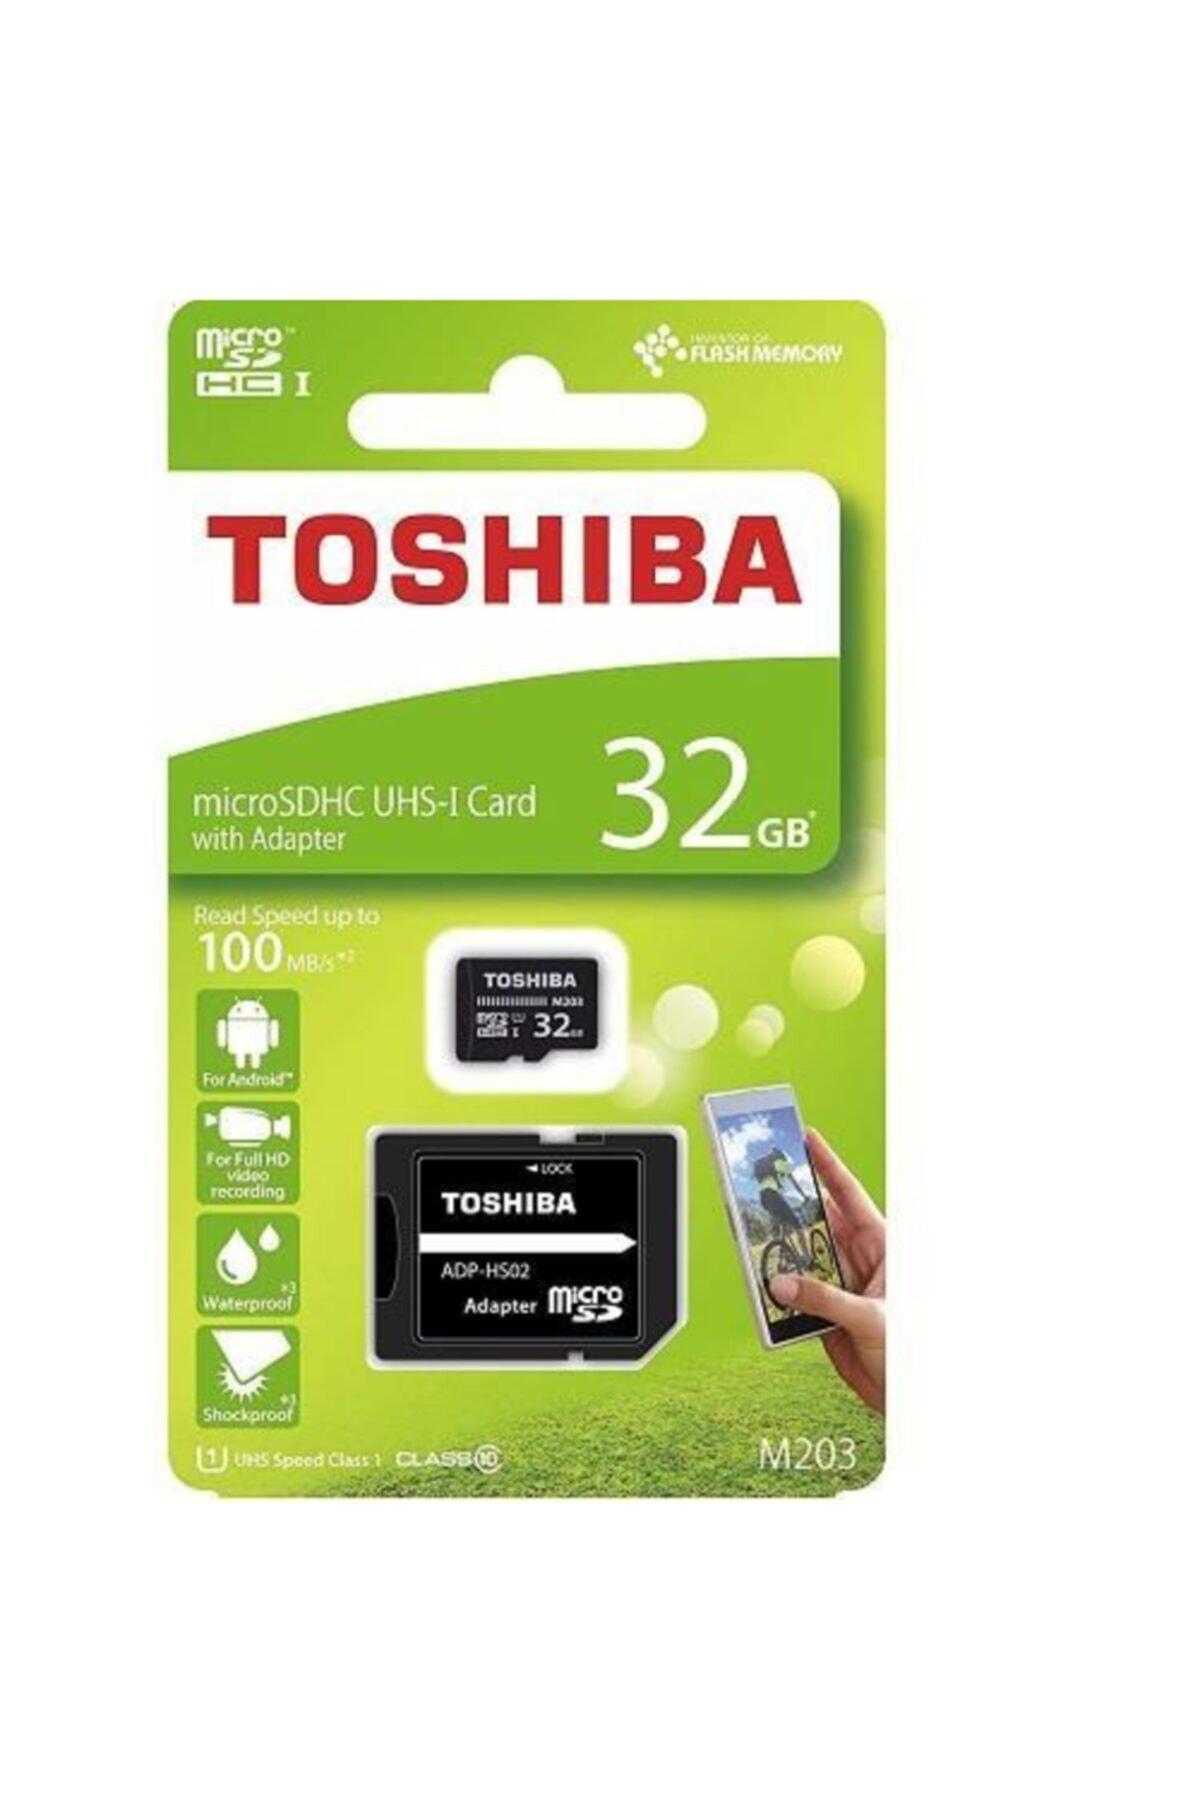 Toshiba 32gb Micro Sdhc Uhs-1 Thn-m203k0320ea Bellek Kartı 1